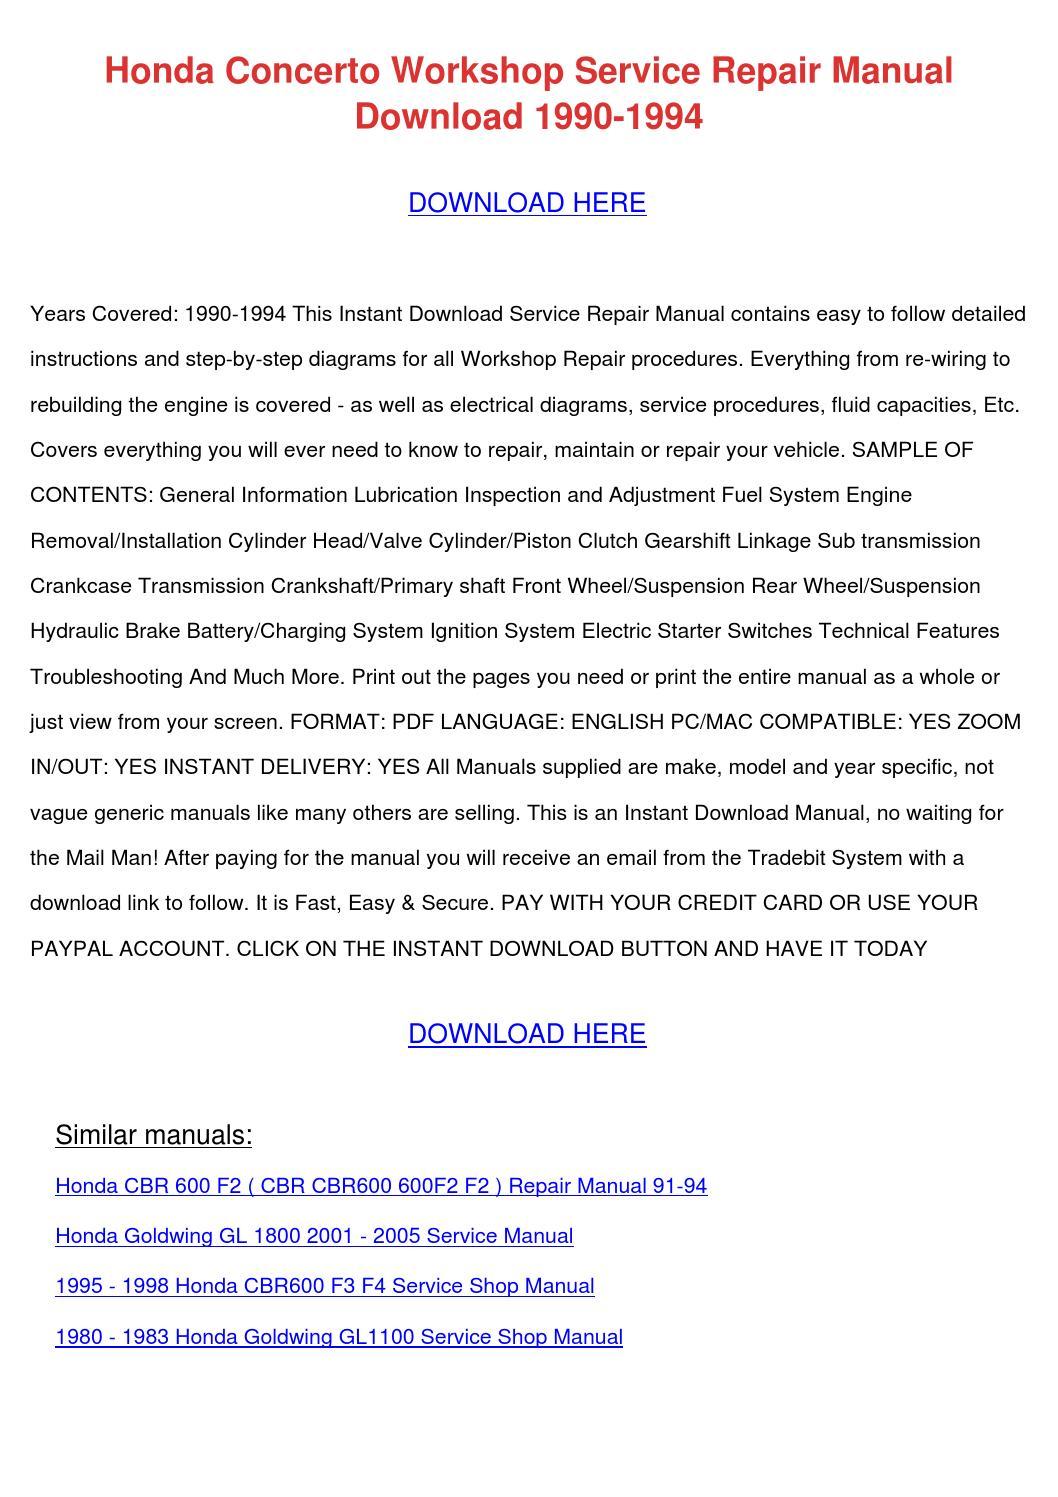 Honda Concerto Workshop Service Repair Manual by MaryMcclung ...